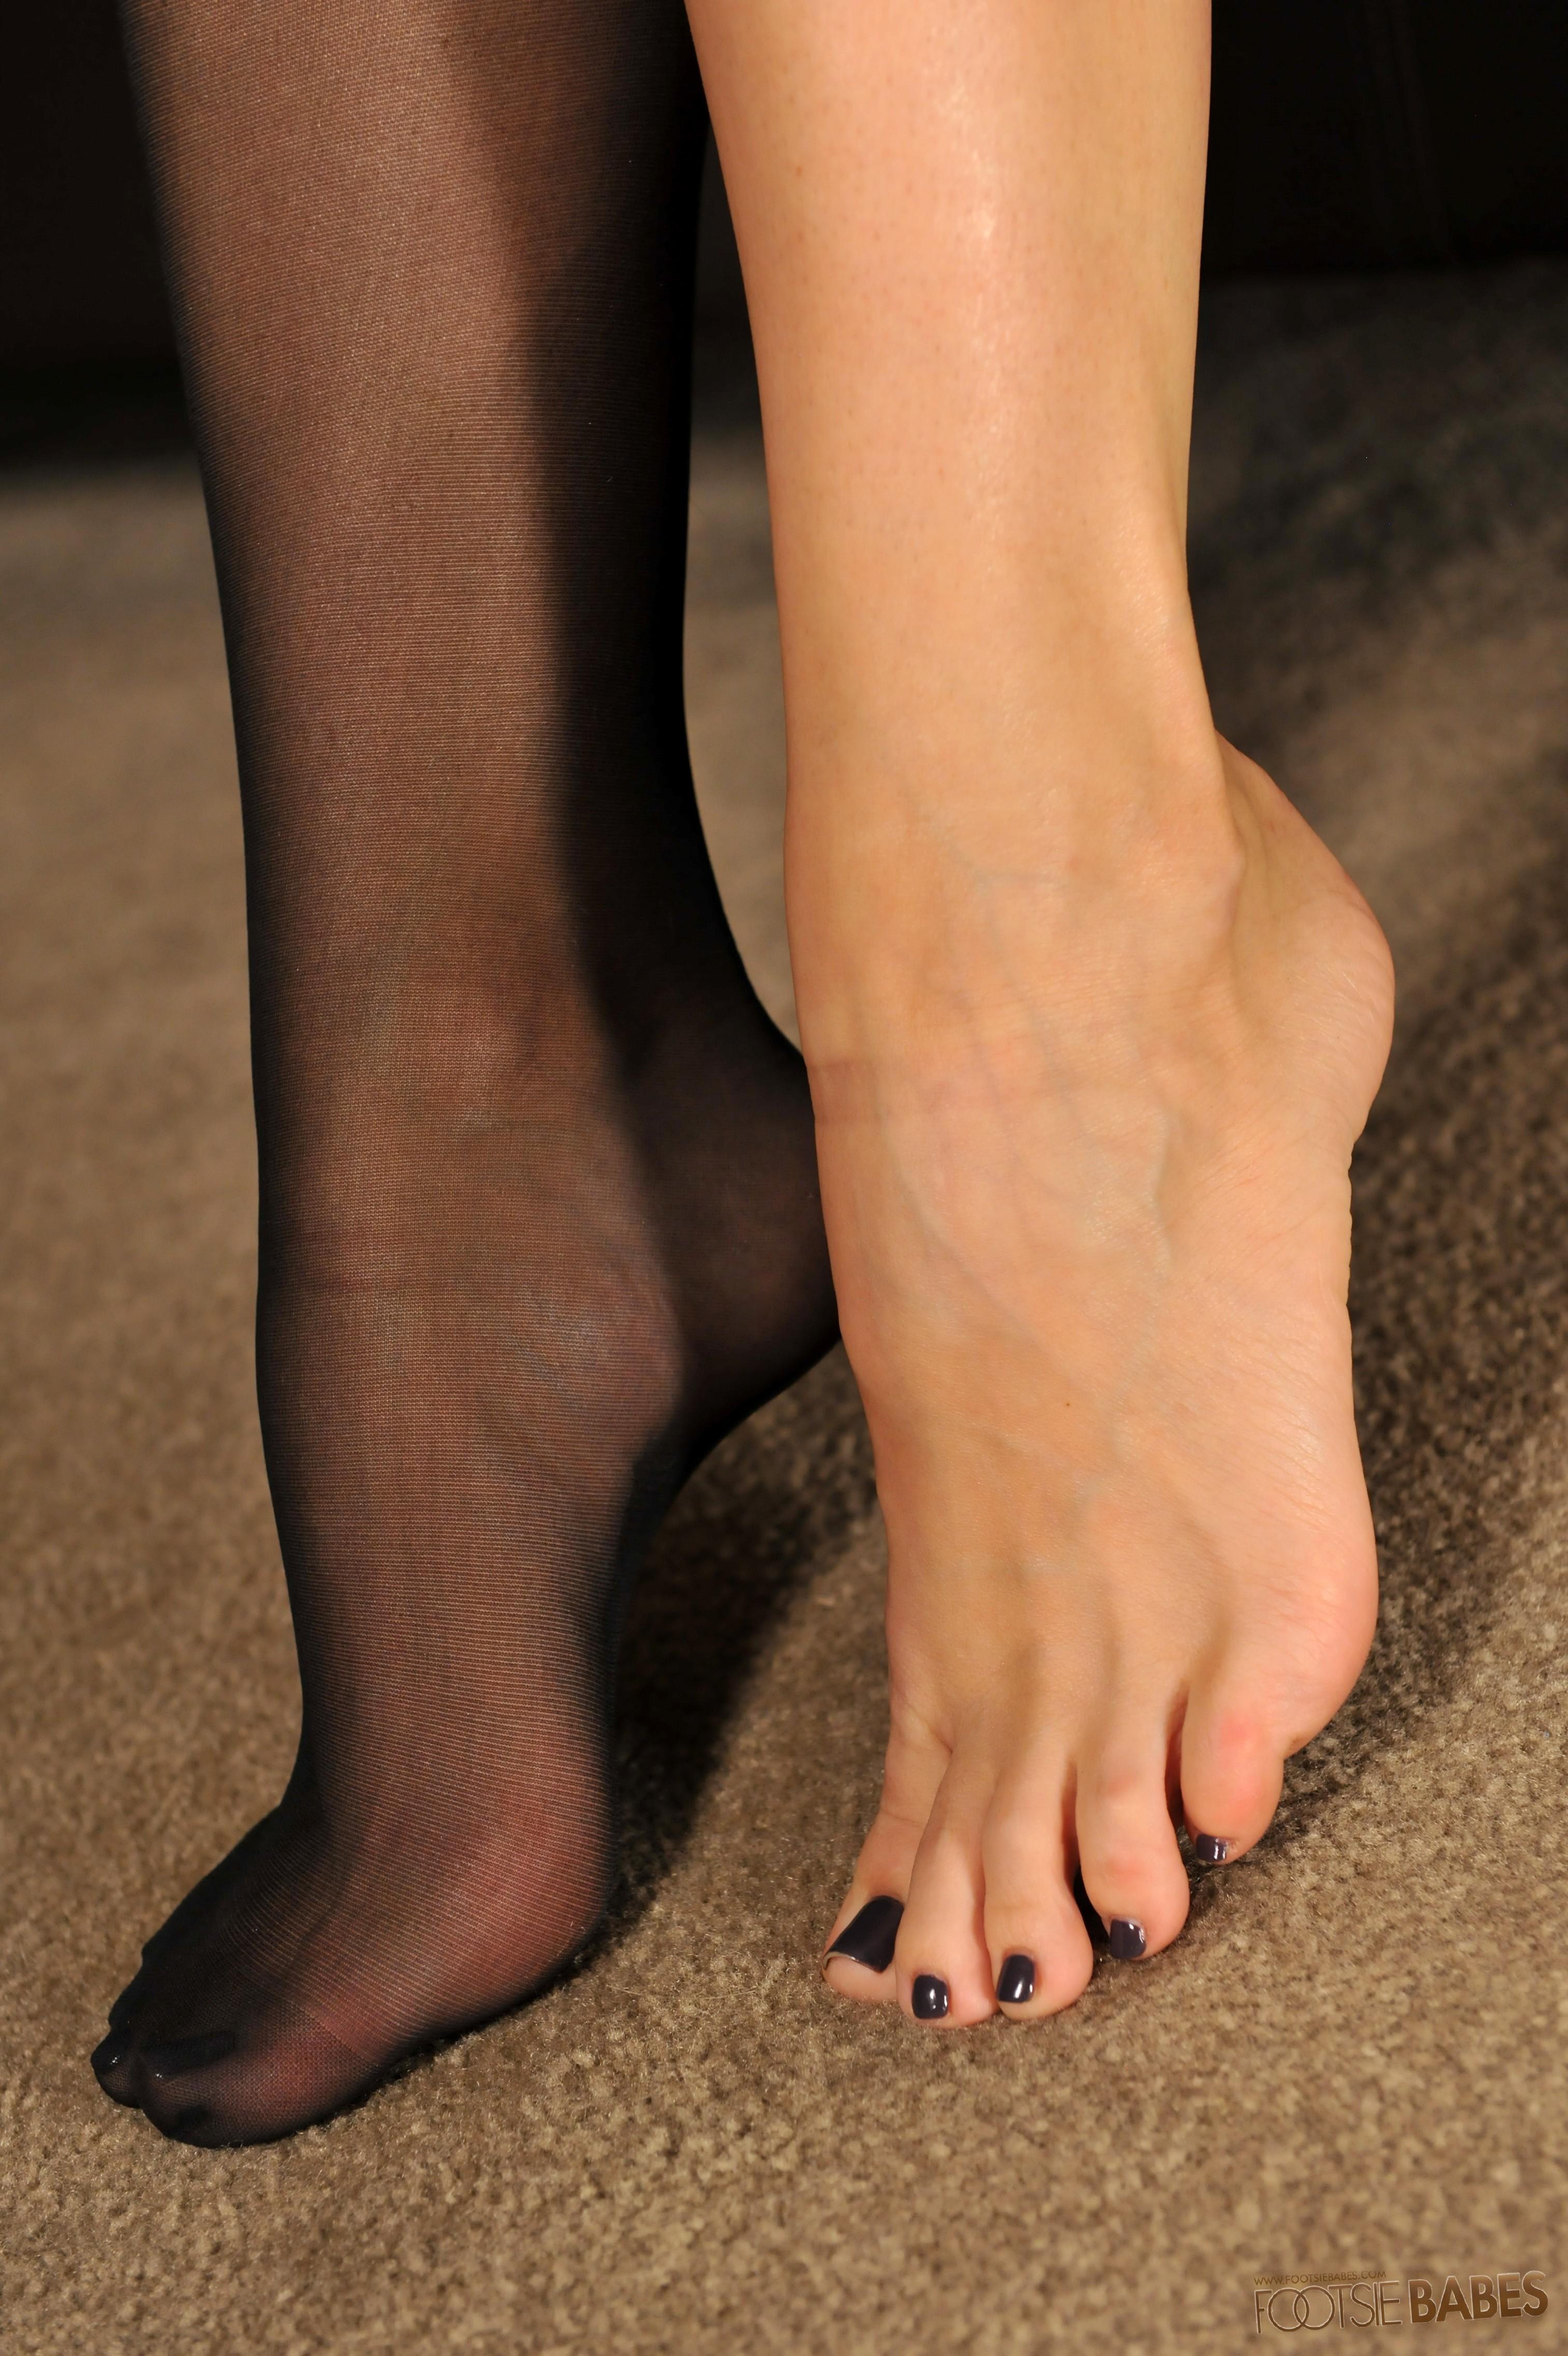 Chanel Prestons Feet